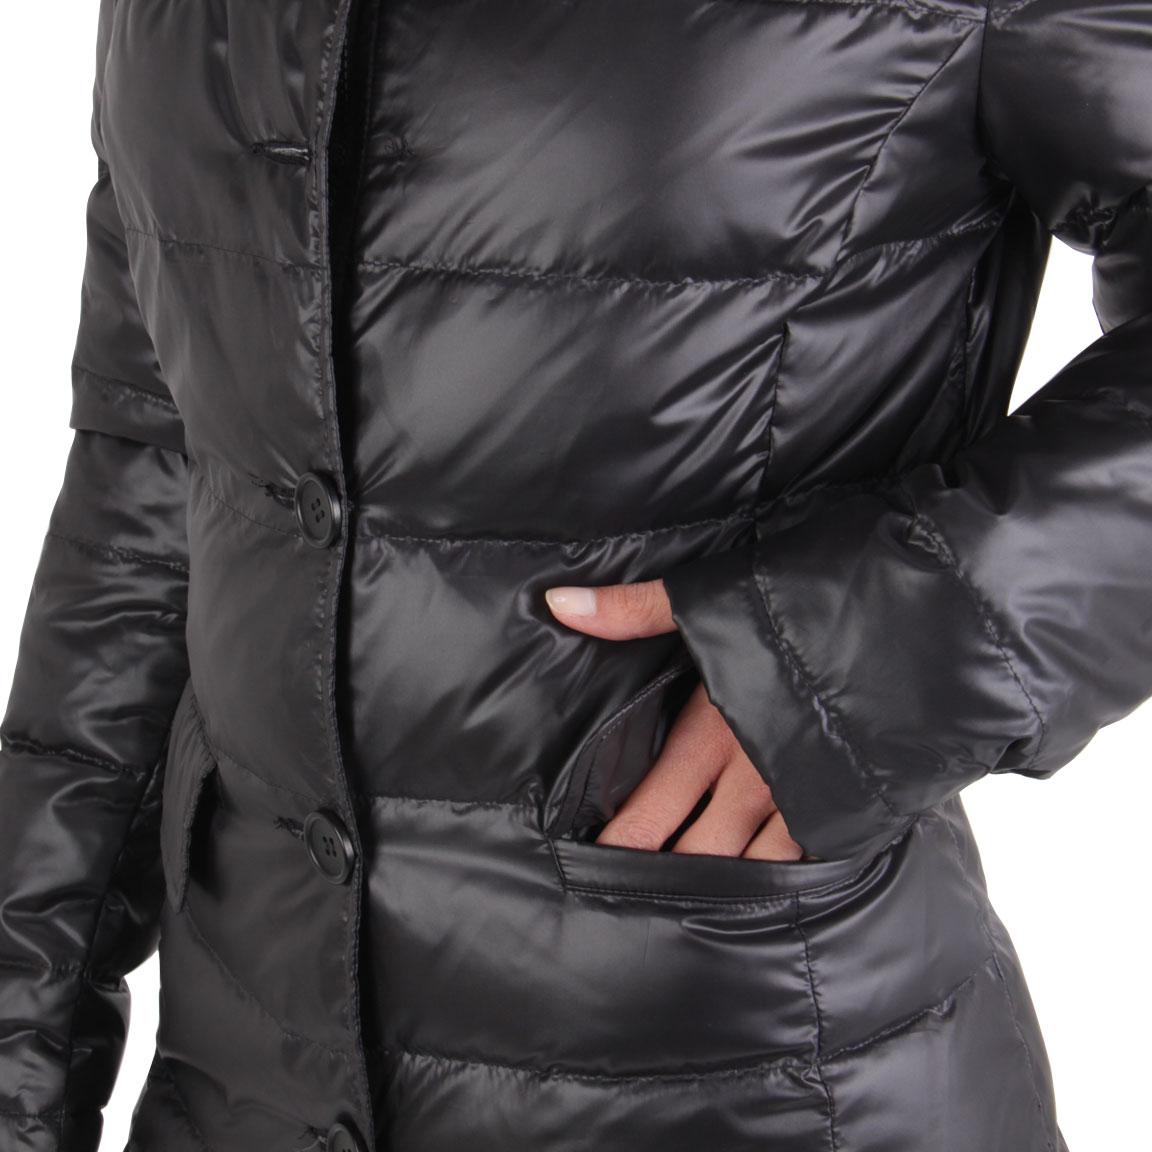 bpd by blauer usa damen winter daunen mantel jacke black bpd0034 gr e s ebay. Black Bedroom Furniture Sets. Home Design Ideas